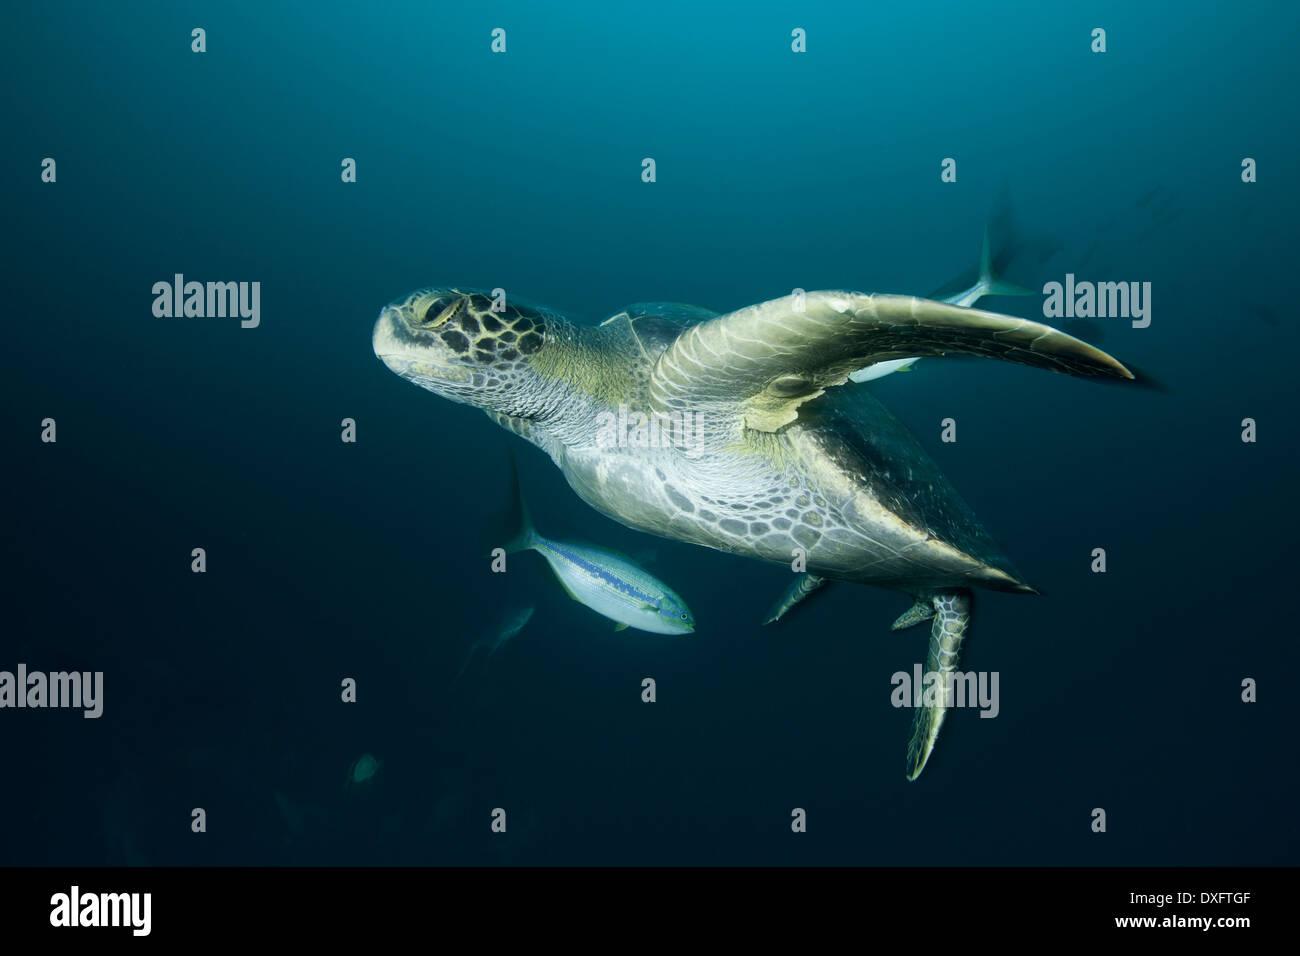 Green Sea Turtle, Chelonia mydas, Cocos Island, Costa Rica - Stock Image